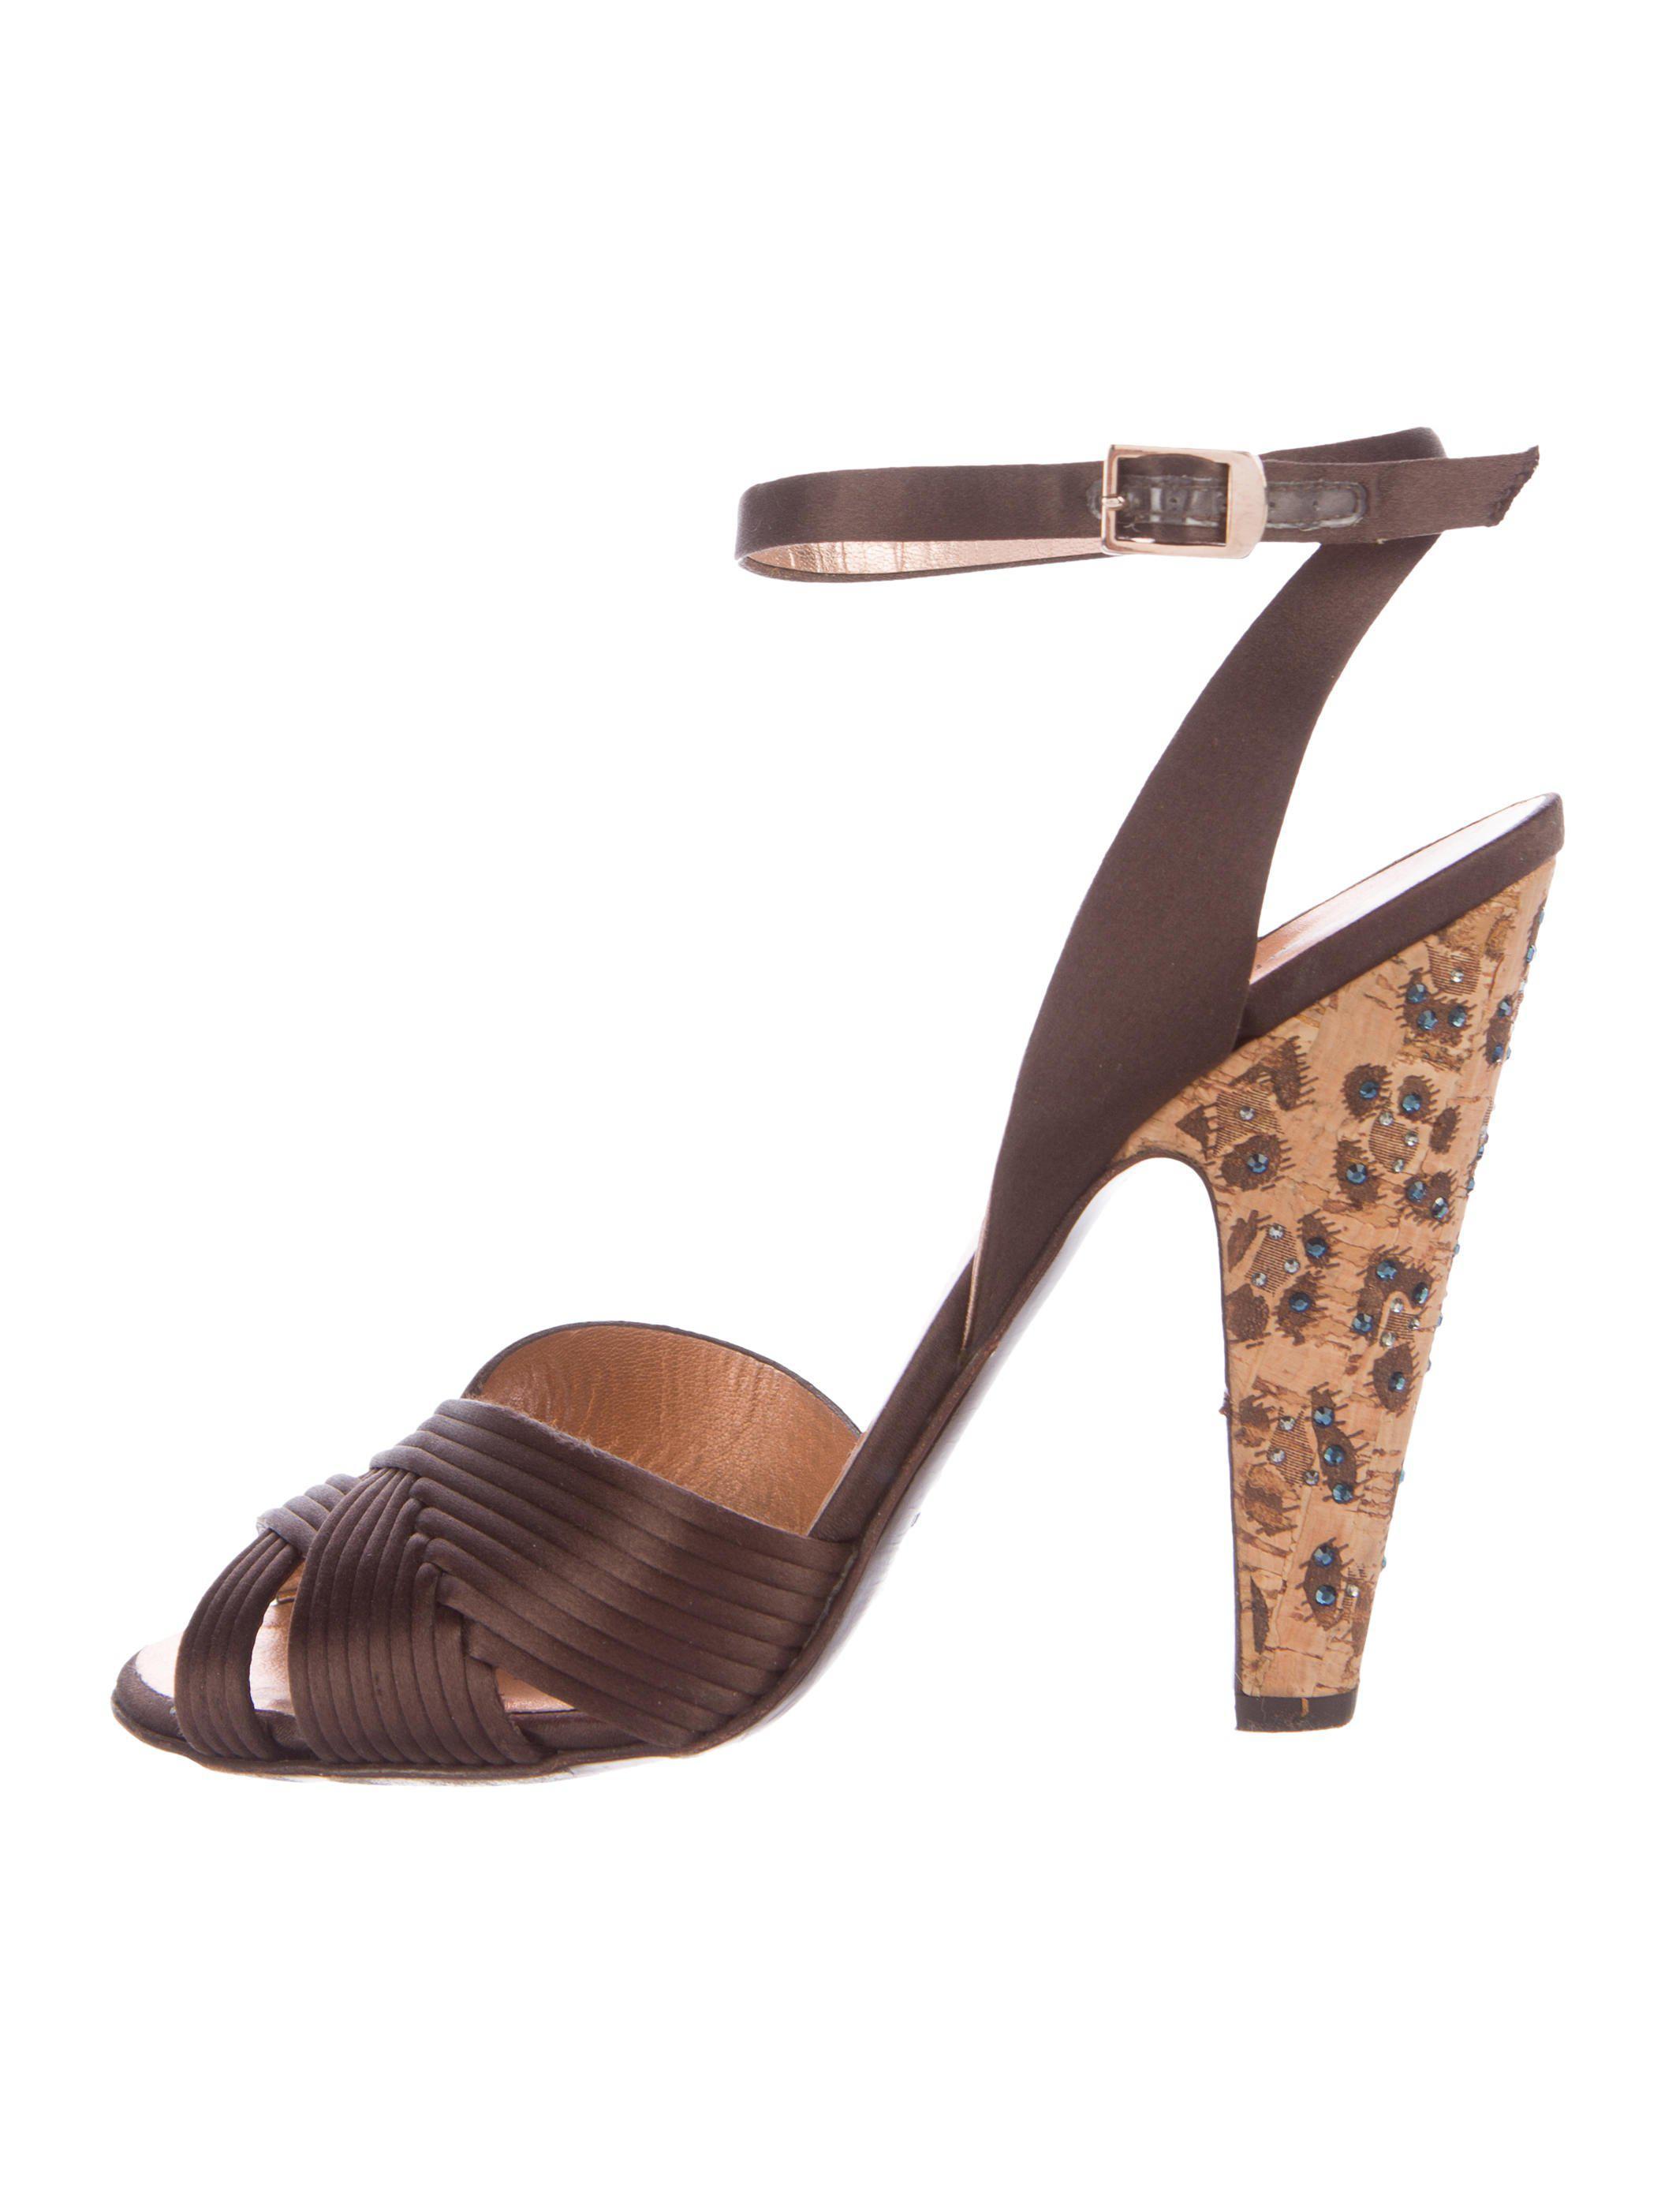 Roberto Cavalli Satin Embellished Sandals 2014 new for sale OwUuN